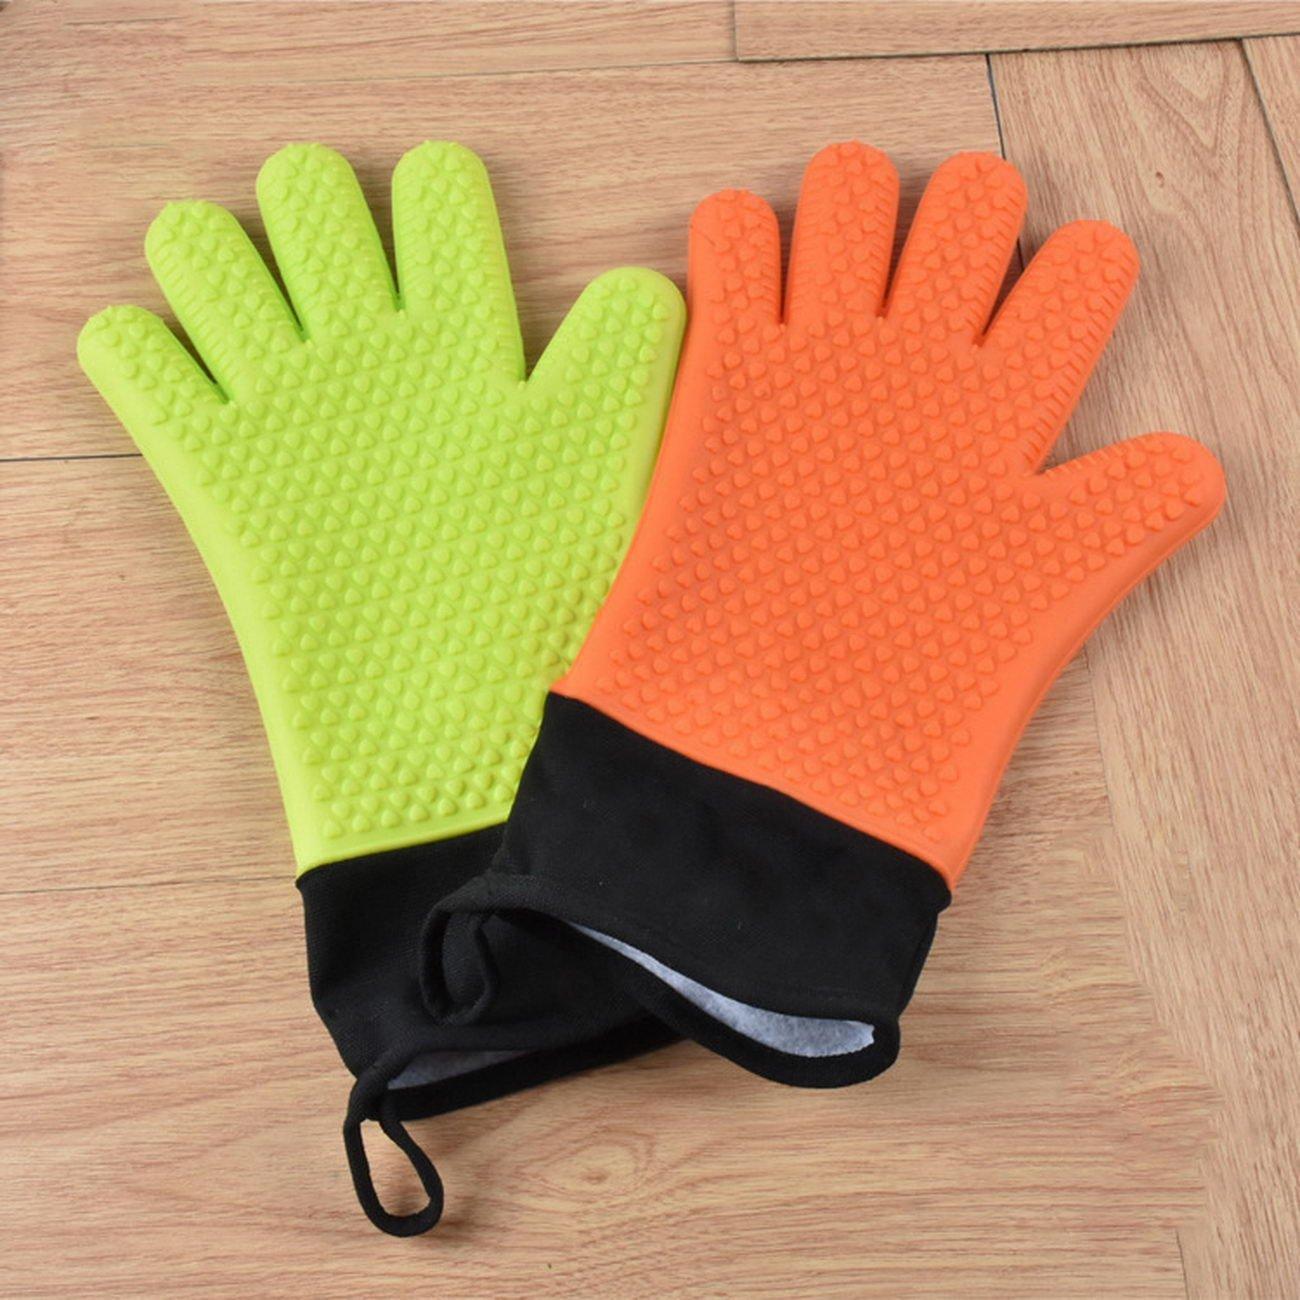 heart household roast household microwave oven silica gel gloves microwave oven gloves, microwave oven gloves, insulated gloves, microwave oven gloves insulated gloves, silicone gloves, gloves slip